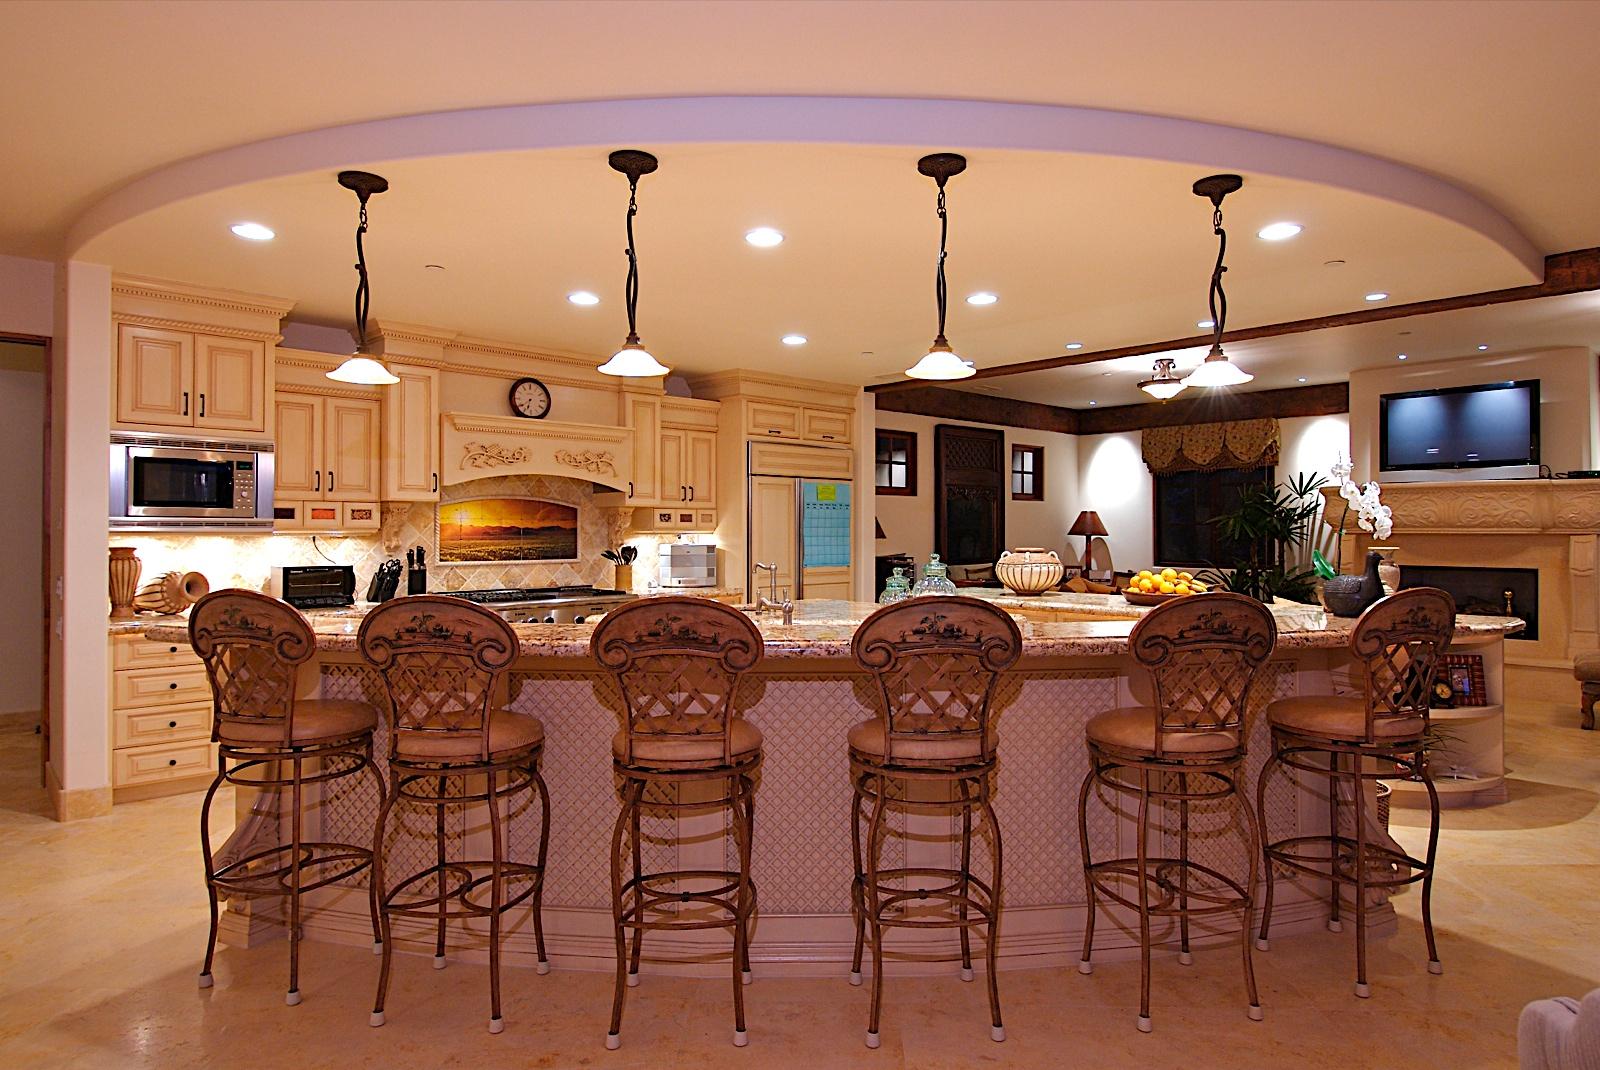 ������ ������� ����� ������ 2015 kitchen-extraordinary-design-ideas-elegant-island-690127.jpg